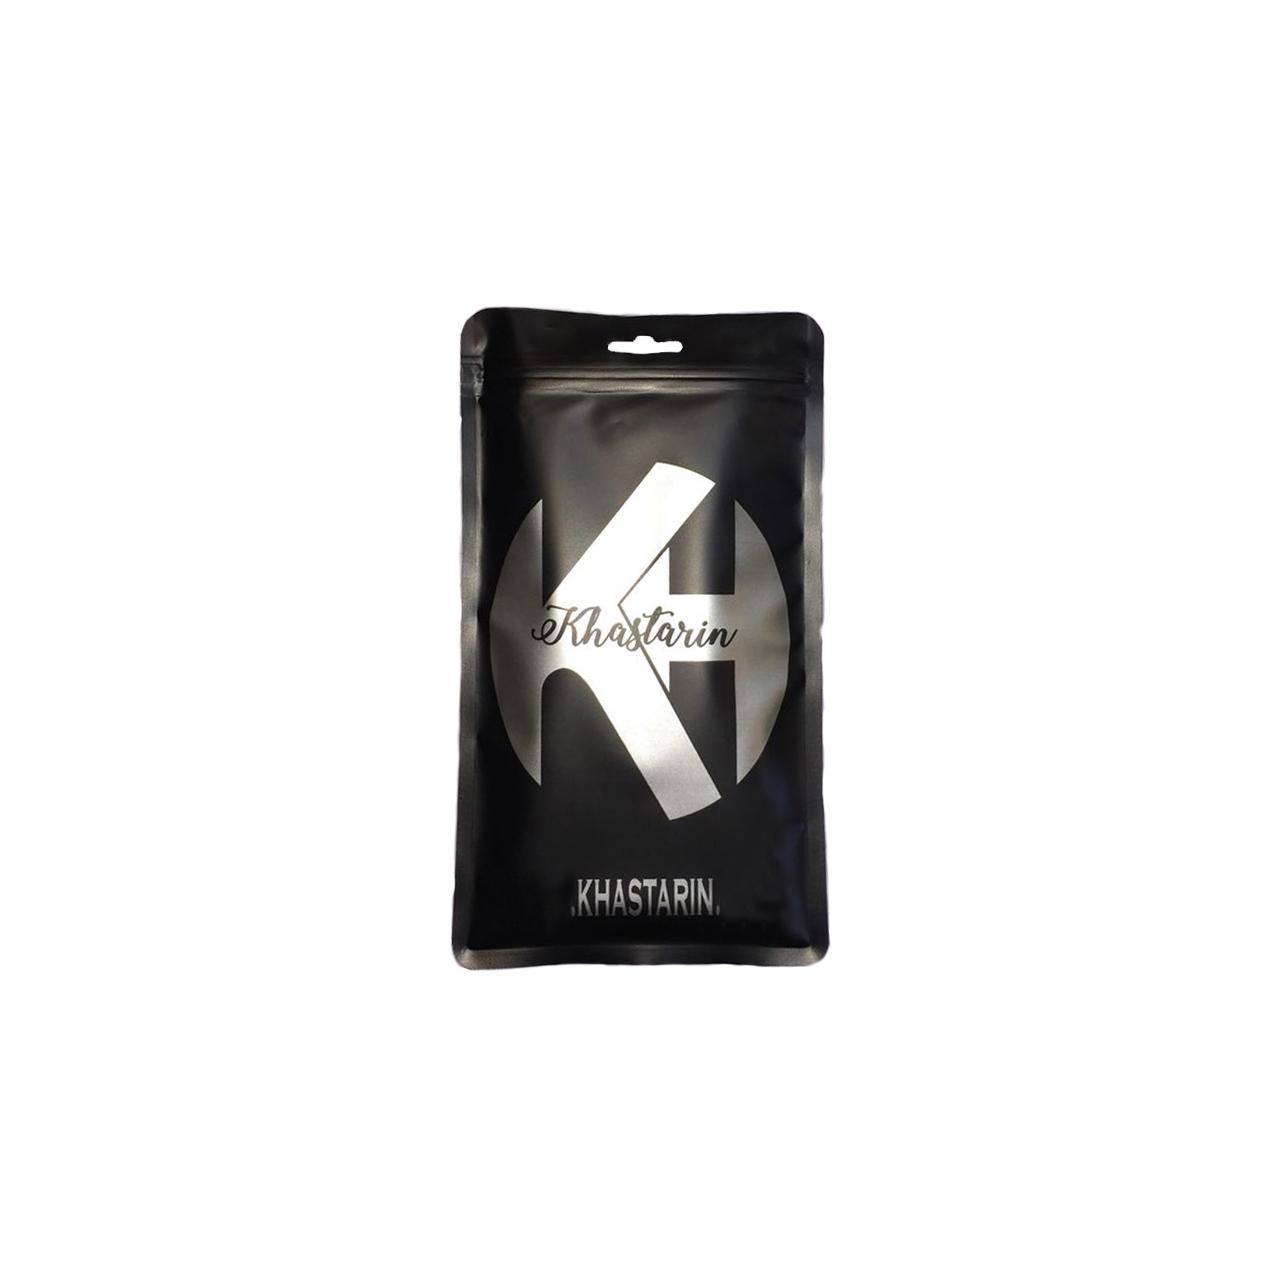 کاور کی اچ کد C19 مناسب برای گوشی موبایل سامسونگ galaxy A710 / A7 2016